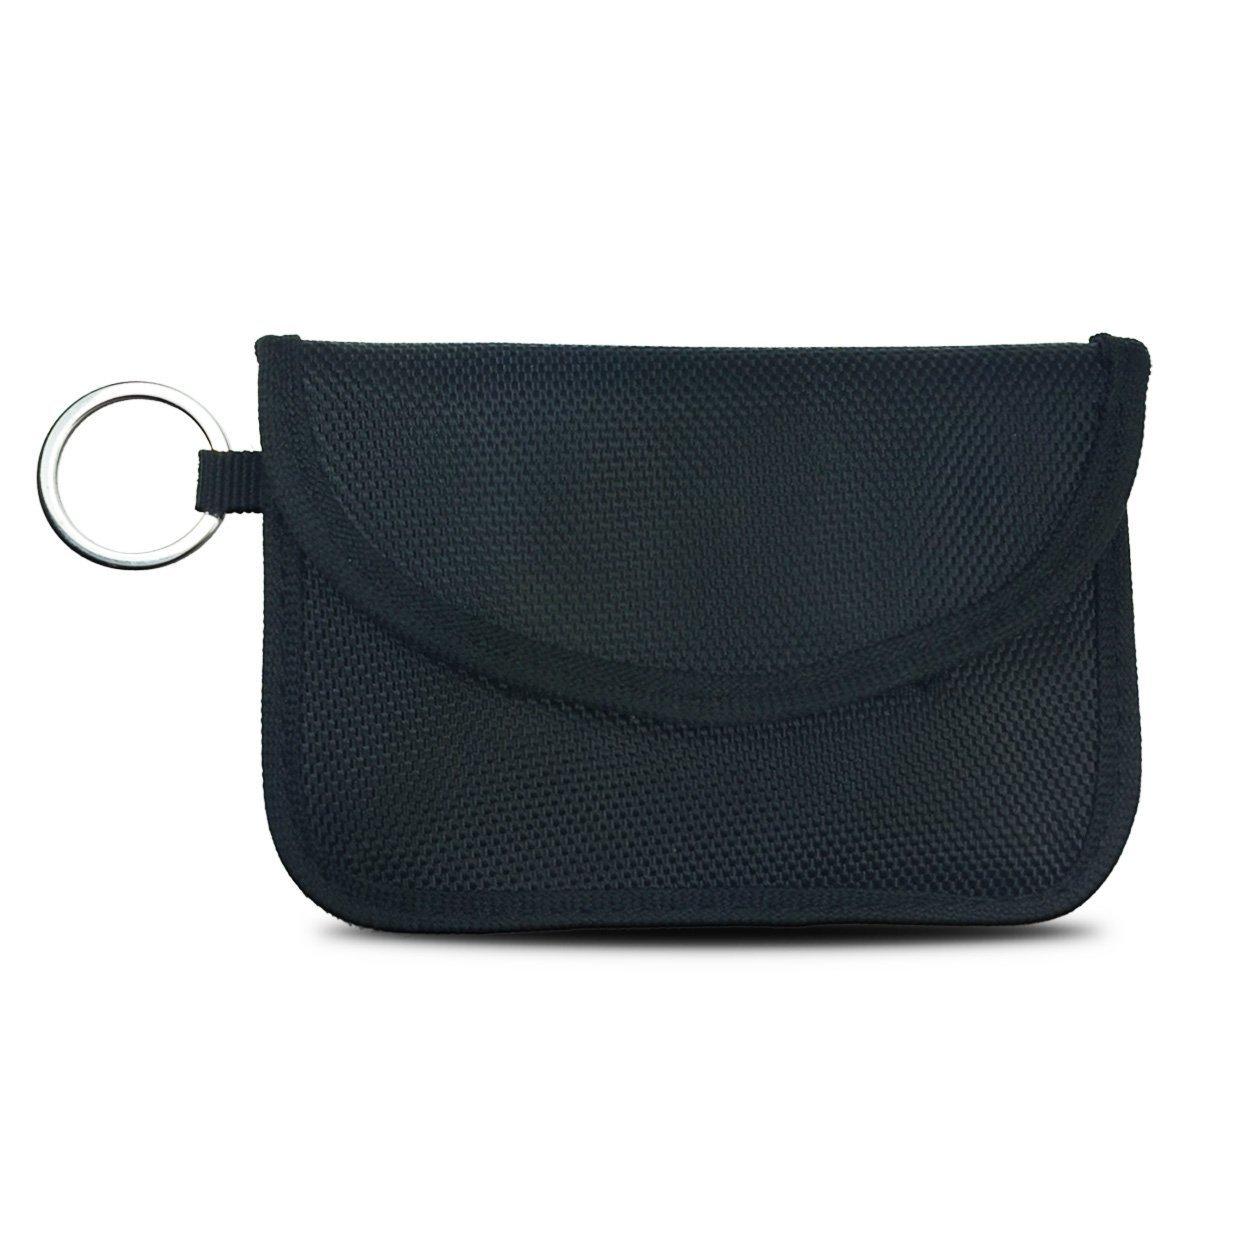 Naviurway Key Fob Signal Blocking Bag Auto RFID Blocking Holder Anti-hacking Security Bag for Car Smart Keyless Entry Remote Fob Controller Black